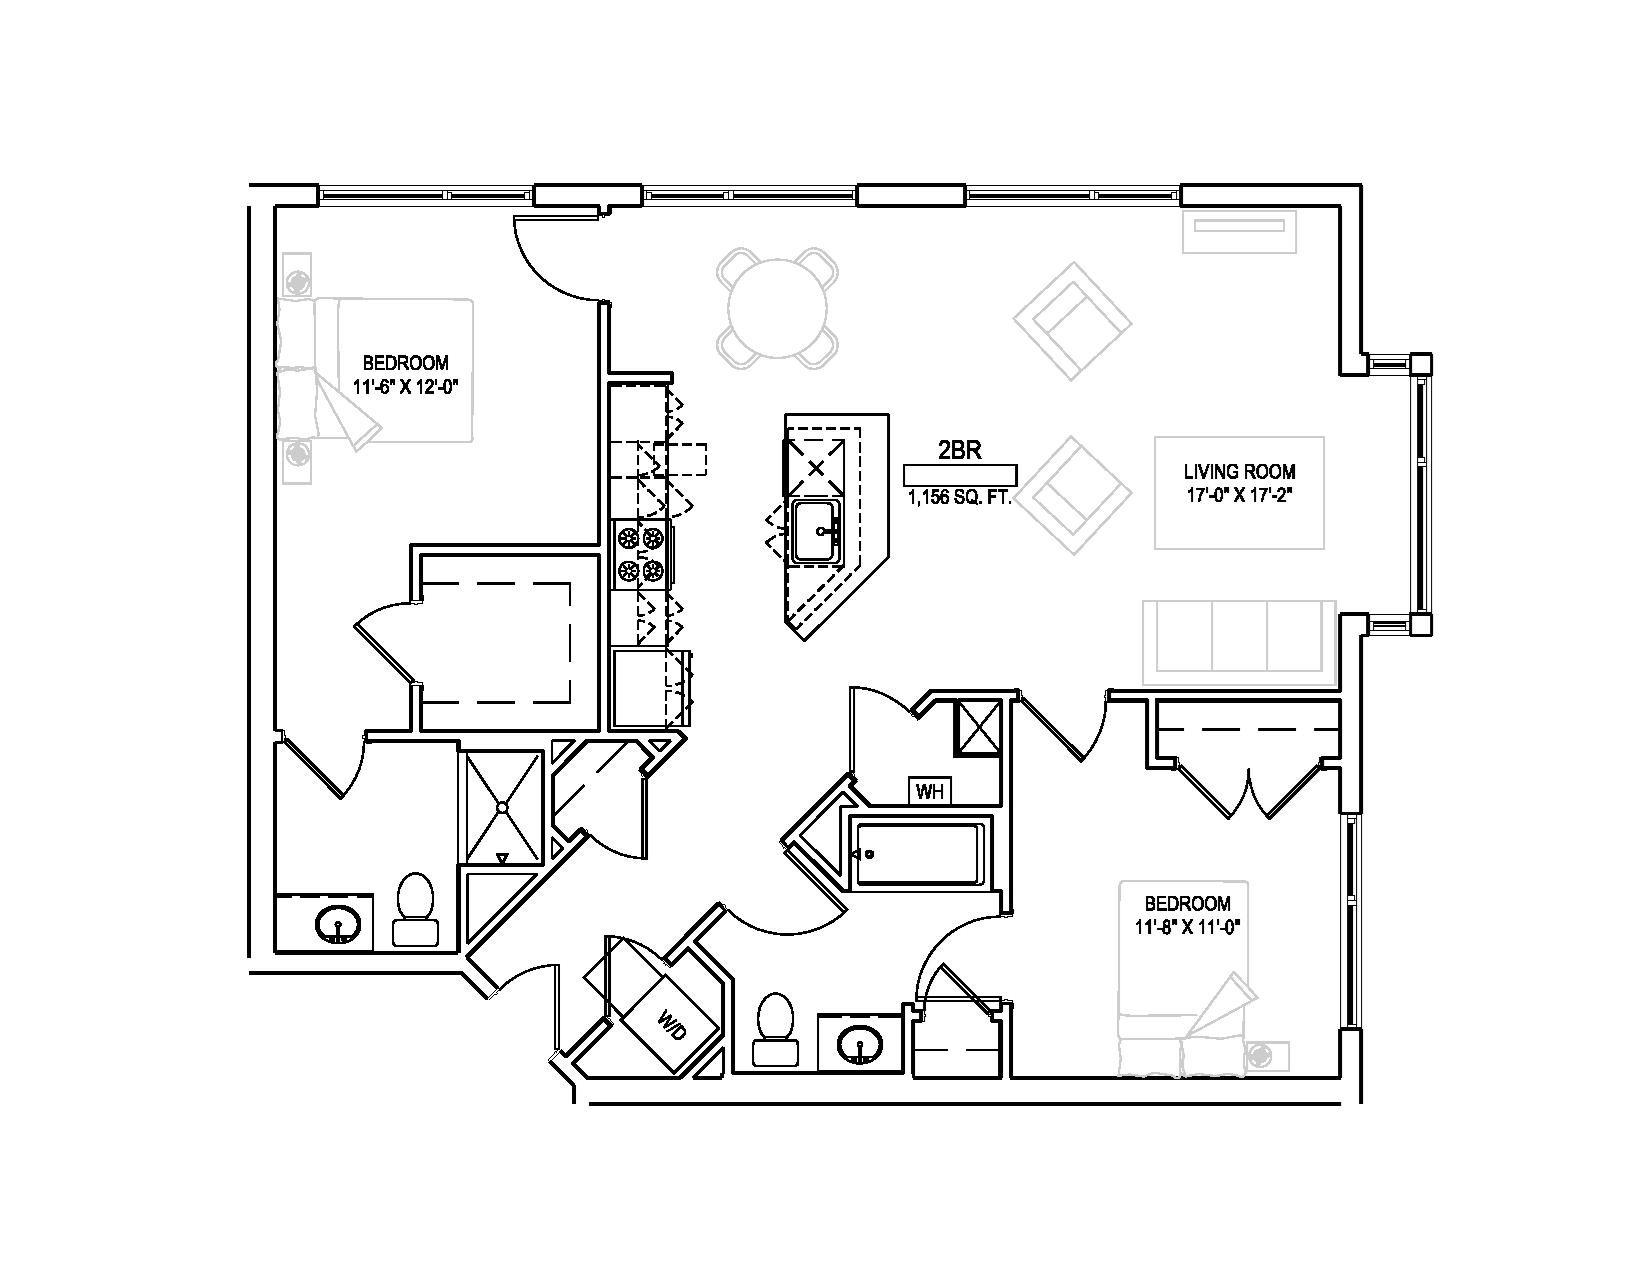 Two bed w/den/Two bath - 1158 sqft. Floor Plan 5